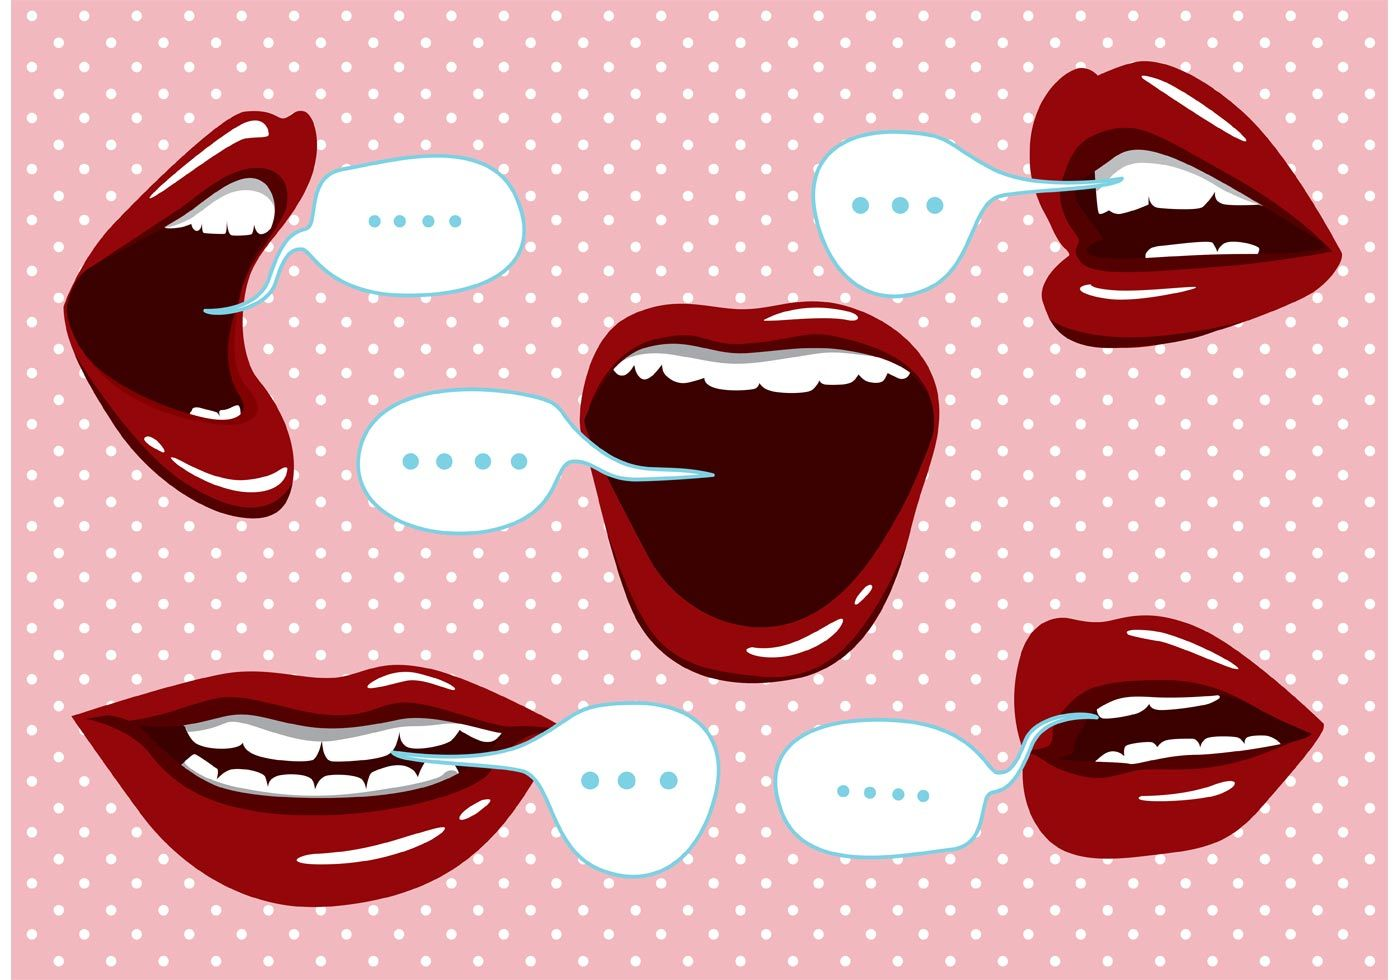 Laughing Mouth Cartoon Transparent Png Laughing Emoji Lip Wallpaper Cartoon Mouths